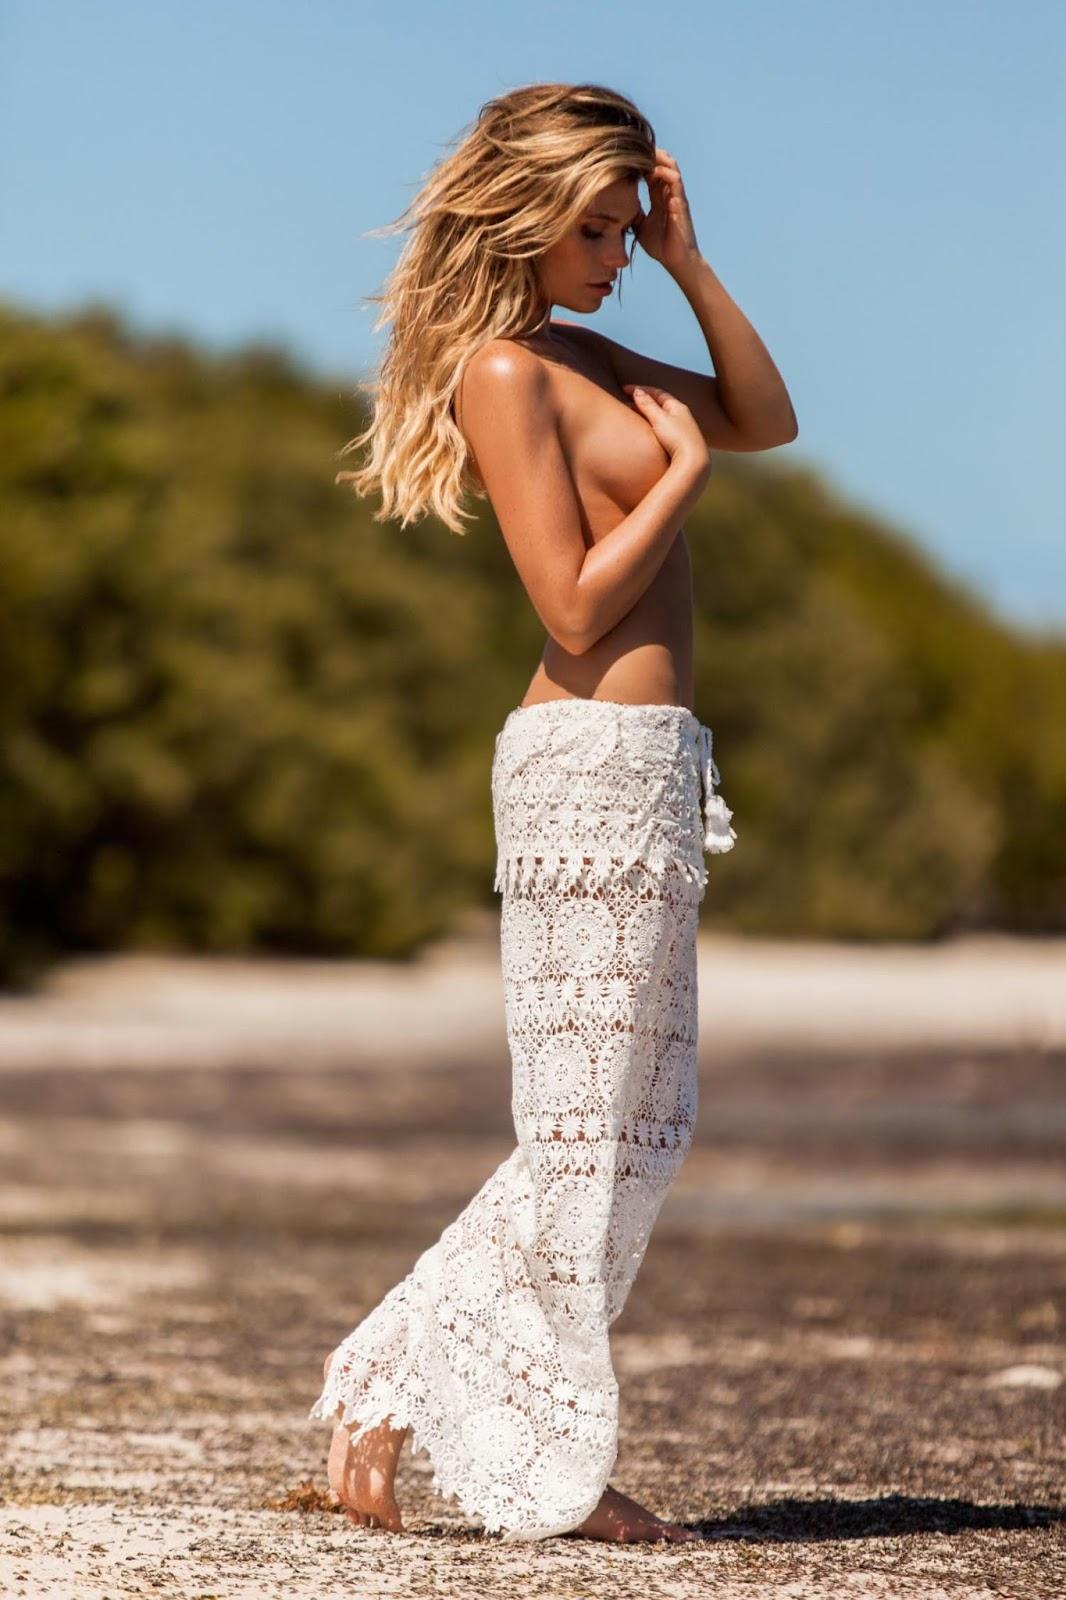 Samantha Hoopes Plumeria Swimwear 2015 Photoshoot